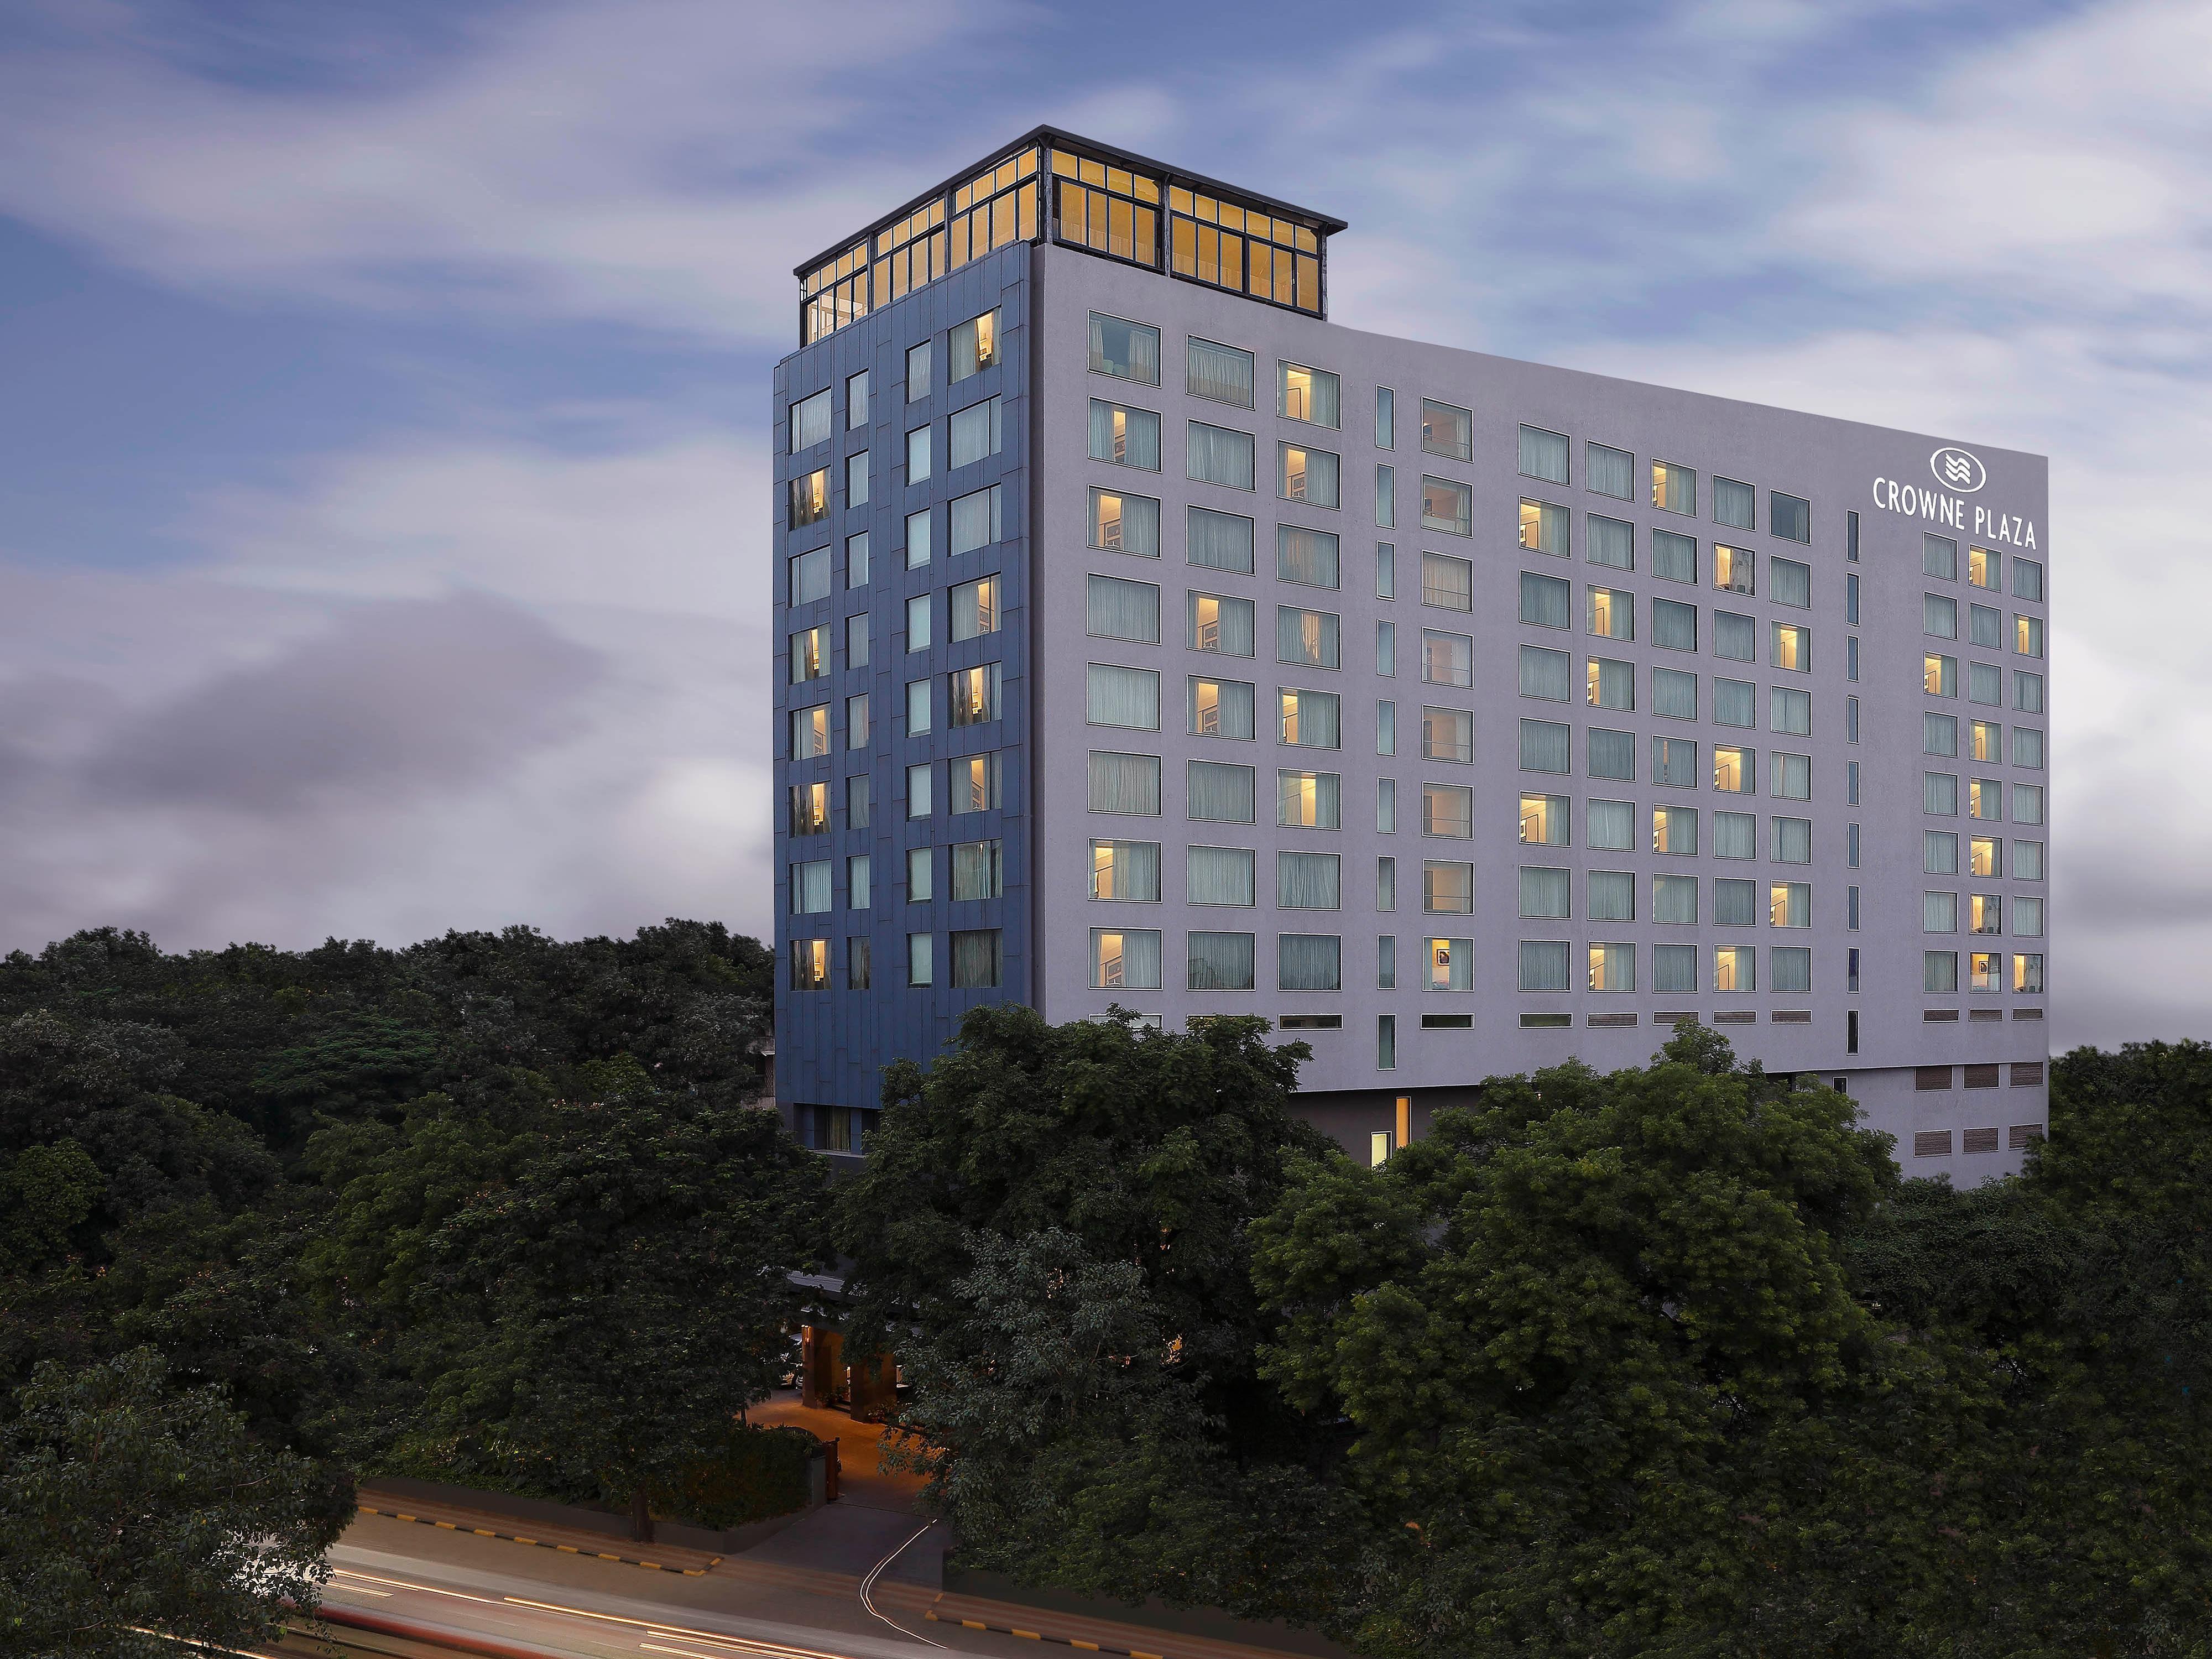 Hotel Delhi City Centre Crowne Plaza Pune City Centre Pune India